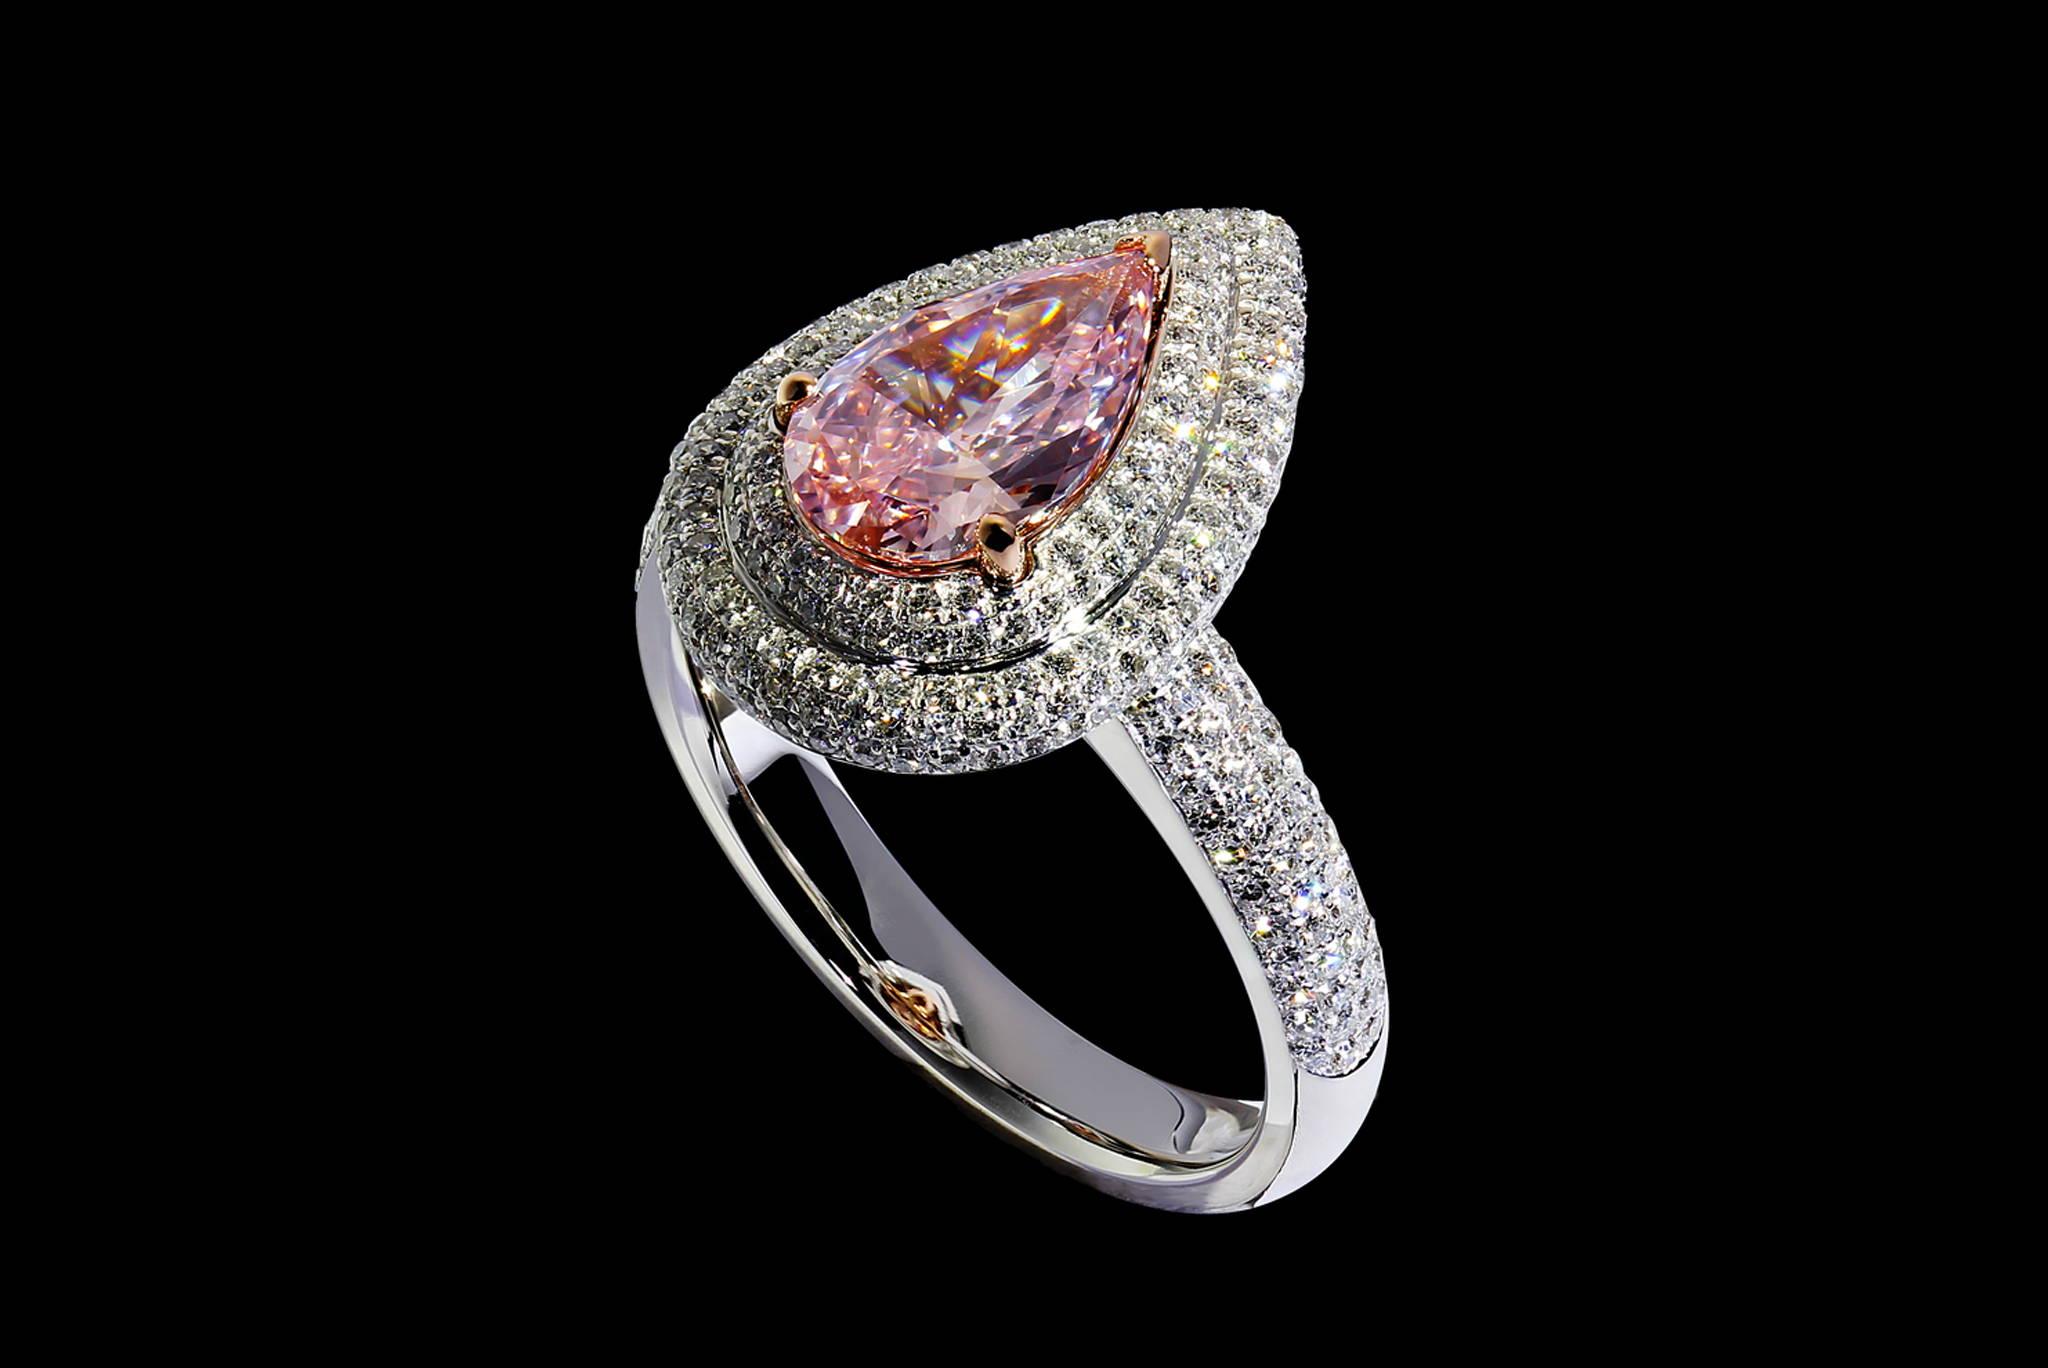 Vintage Style Pink Diamond Ring